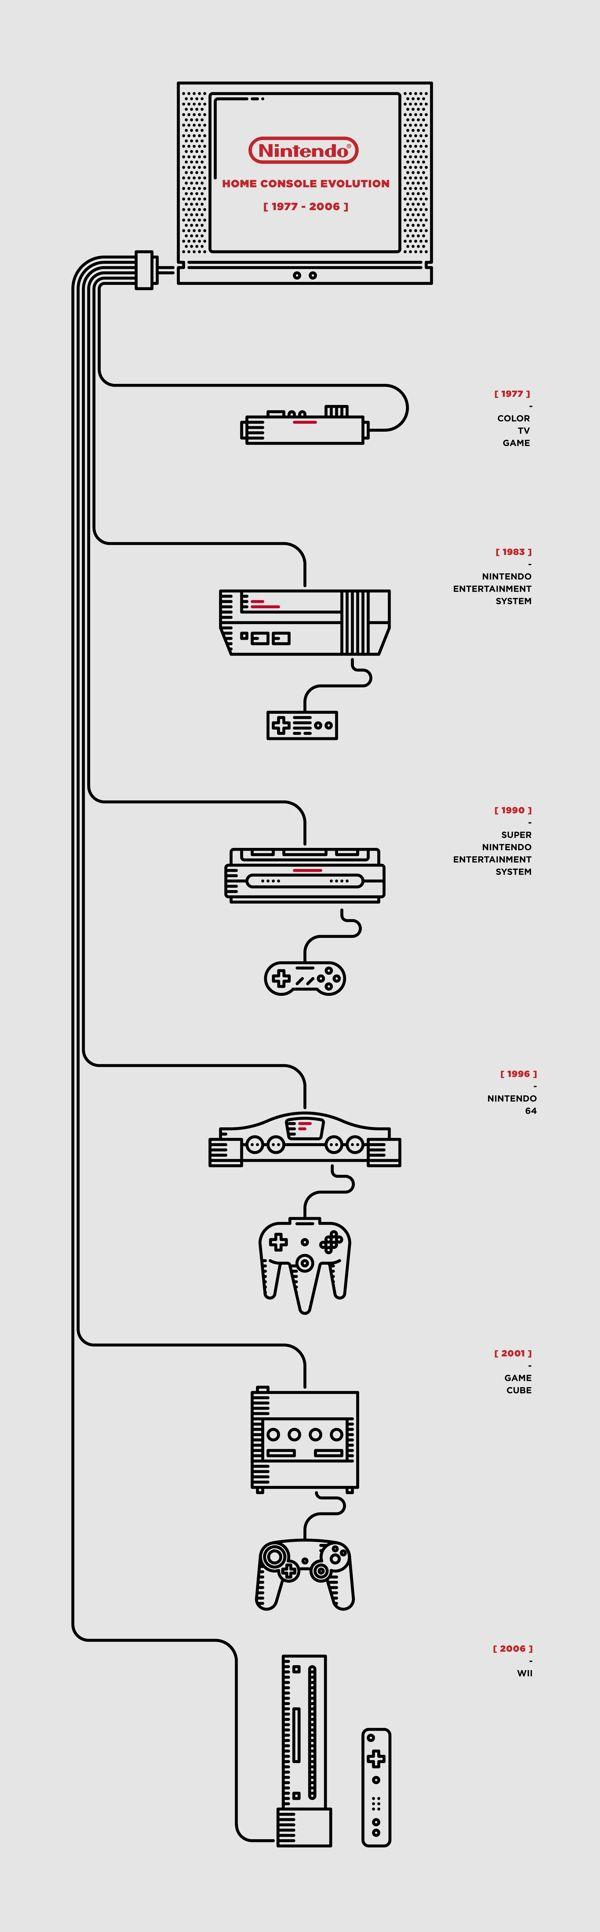 #infographic by  Luca Zanellato #information #design